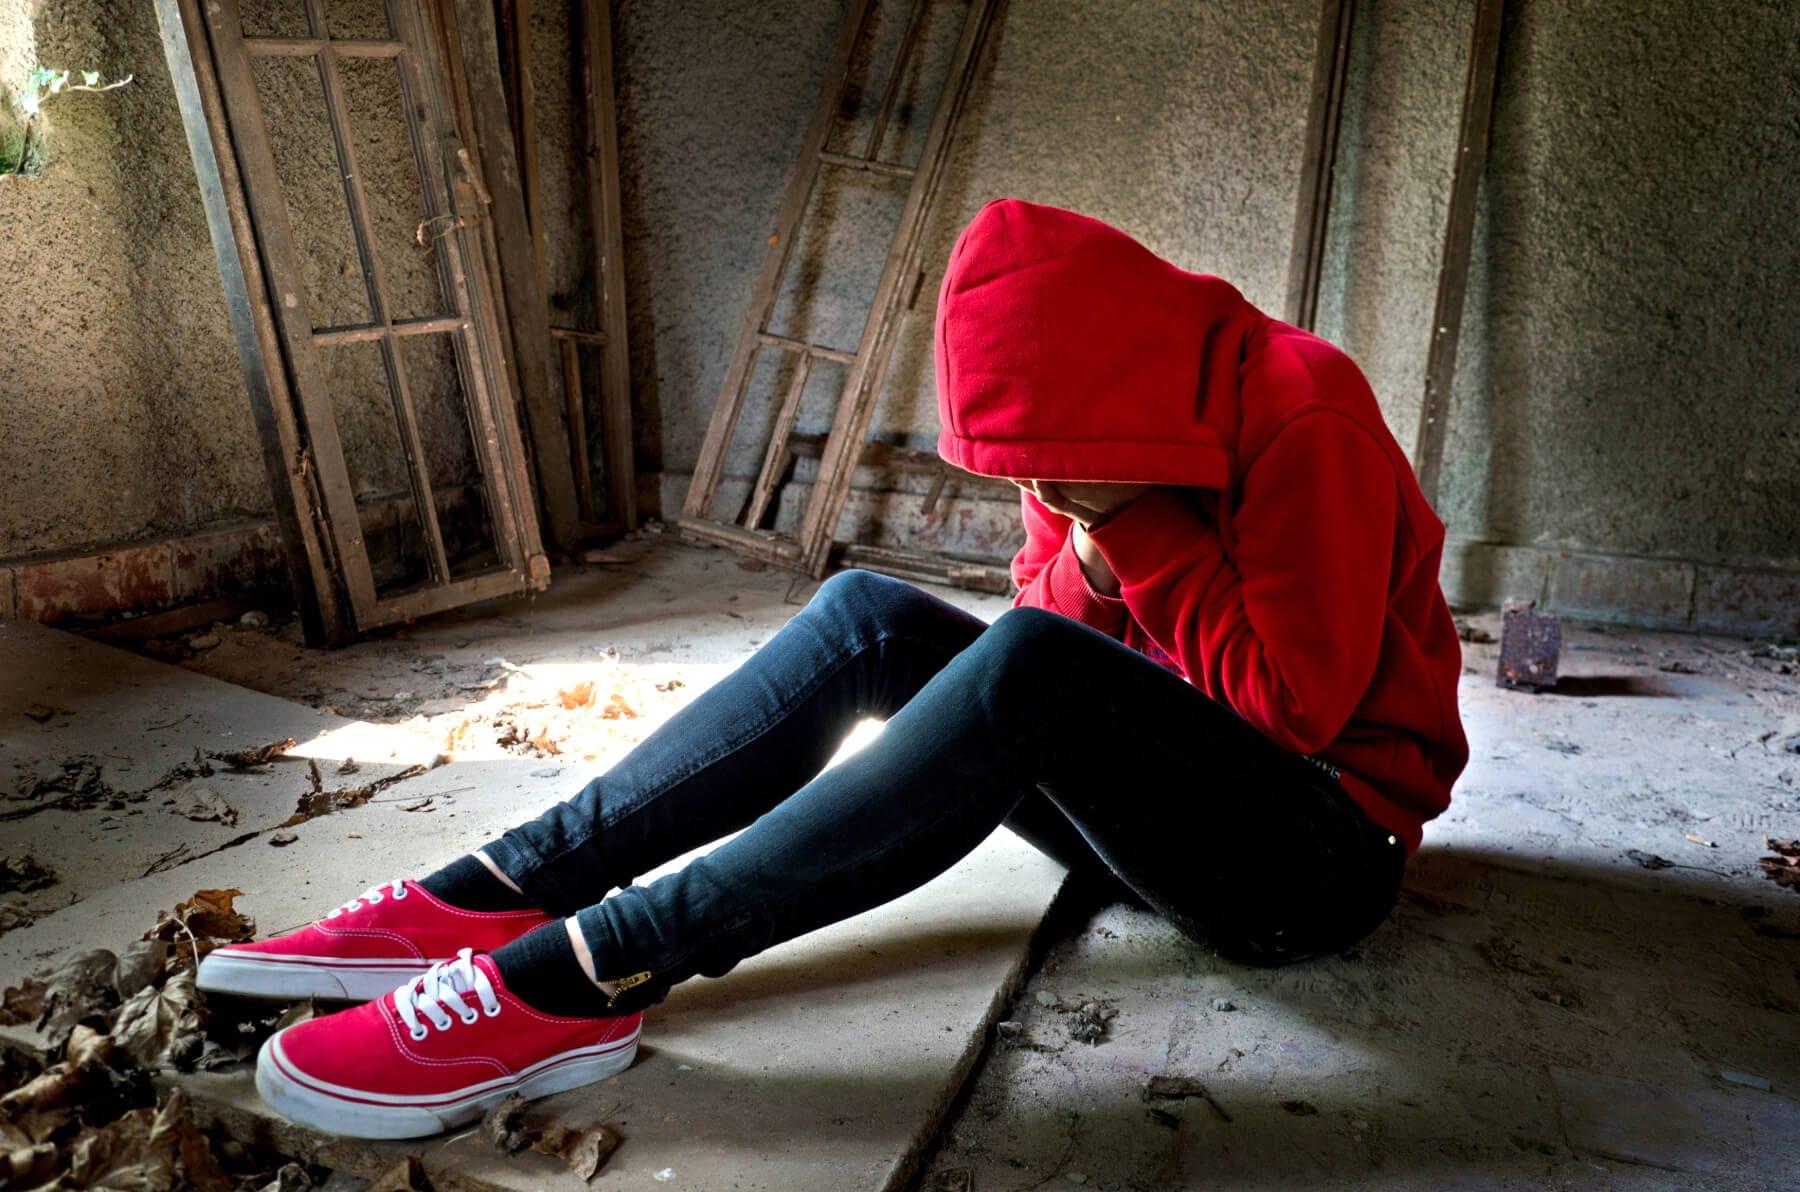 Teenage Drug Addiction Why They Use Harmful Substances